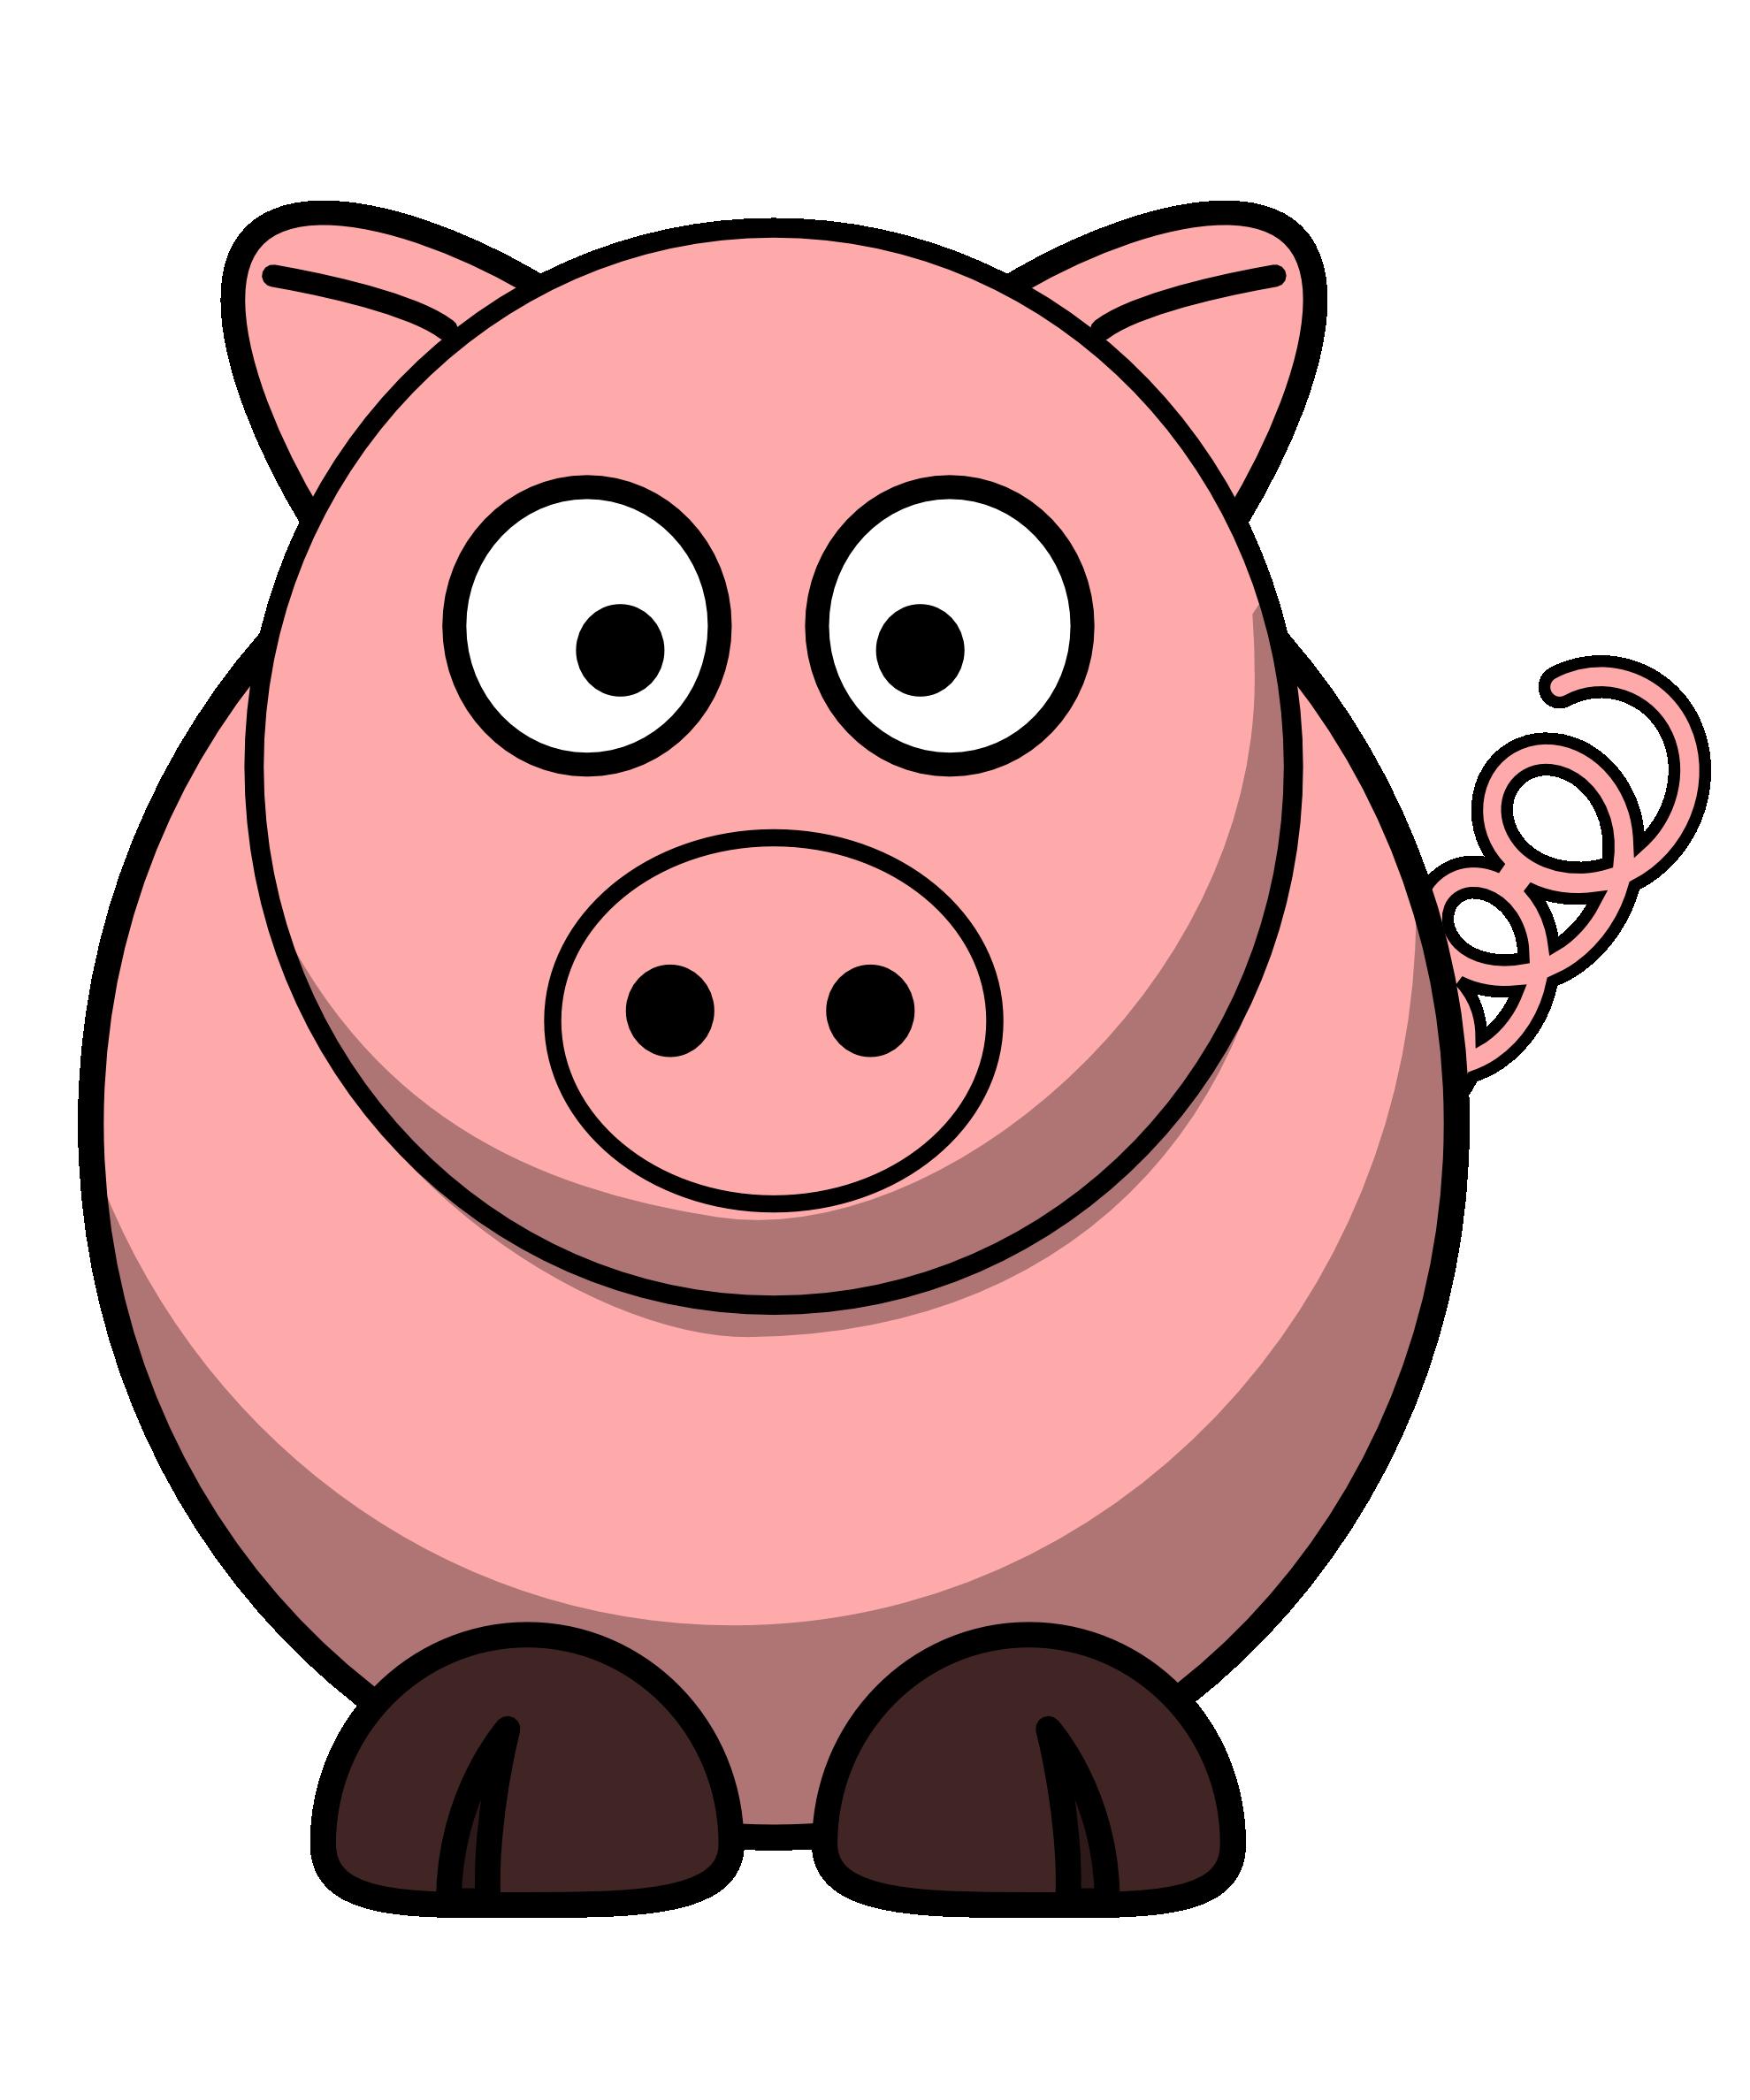 Pig png mart. Pigs clipart transparent background